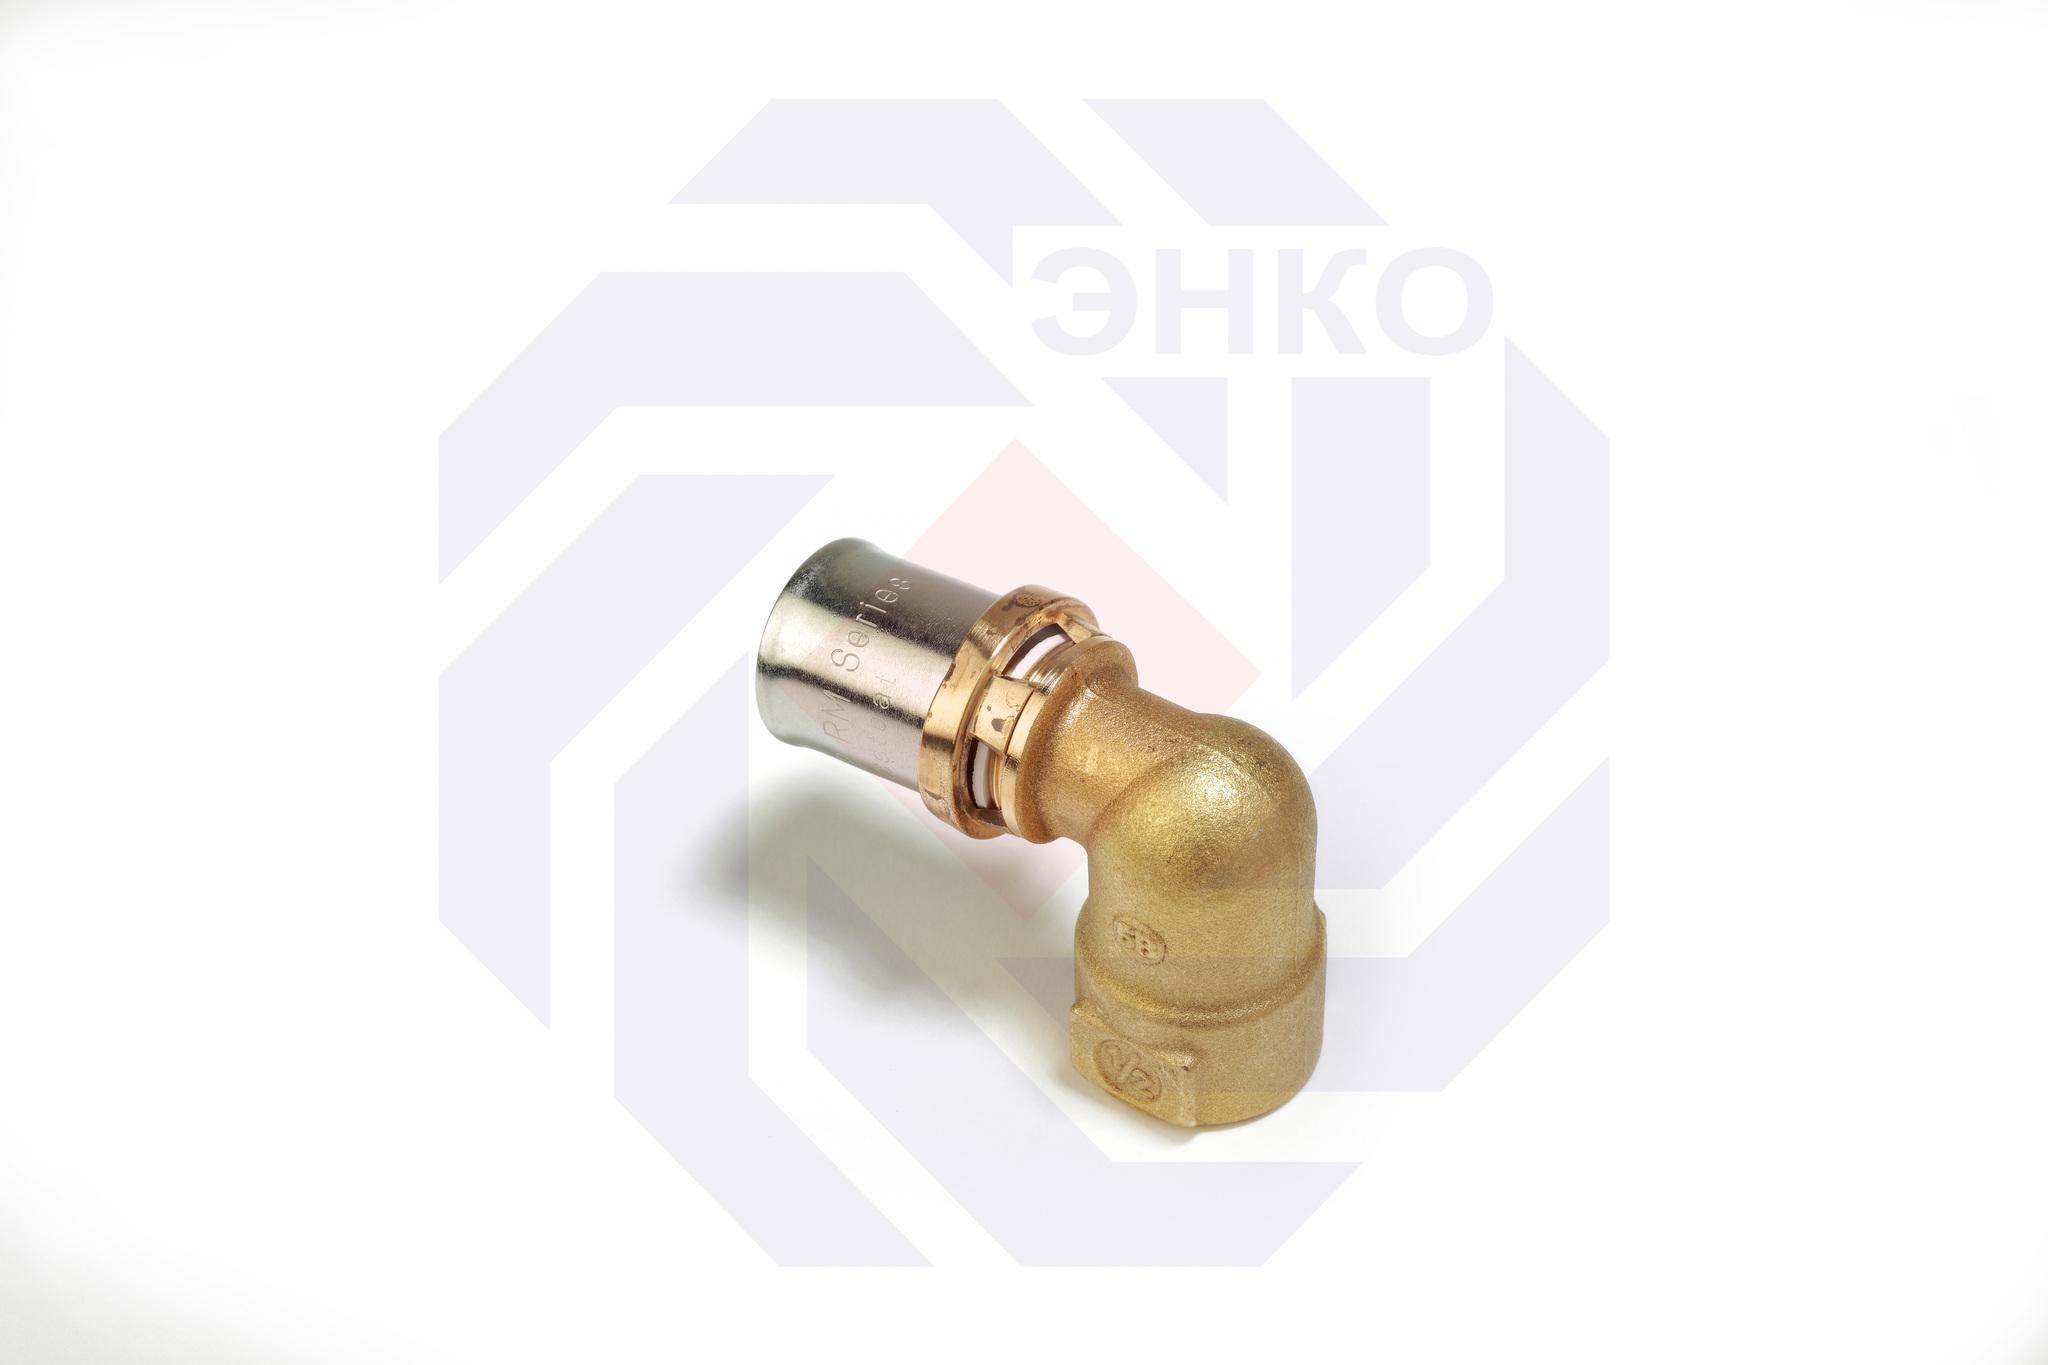 Пресс-фитинг отвод 90° ВР GIACOMINI RM 20⨯½